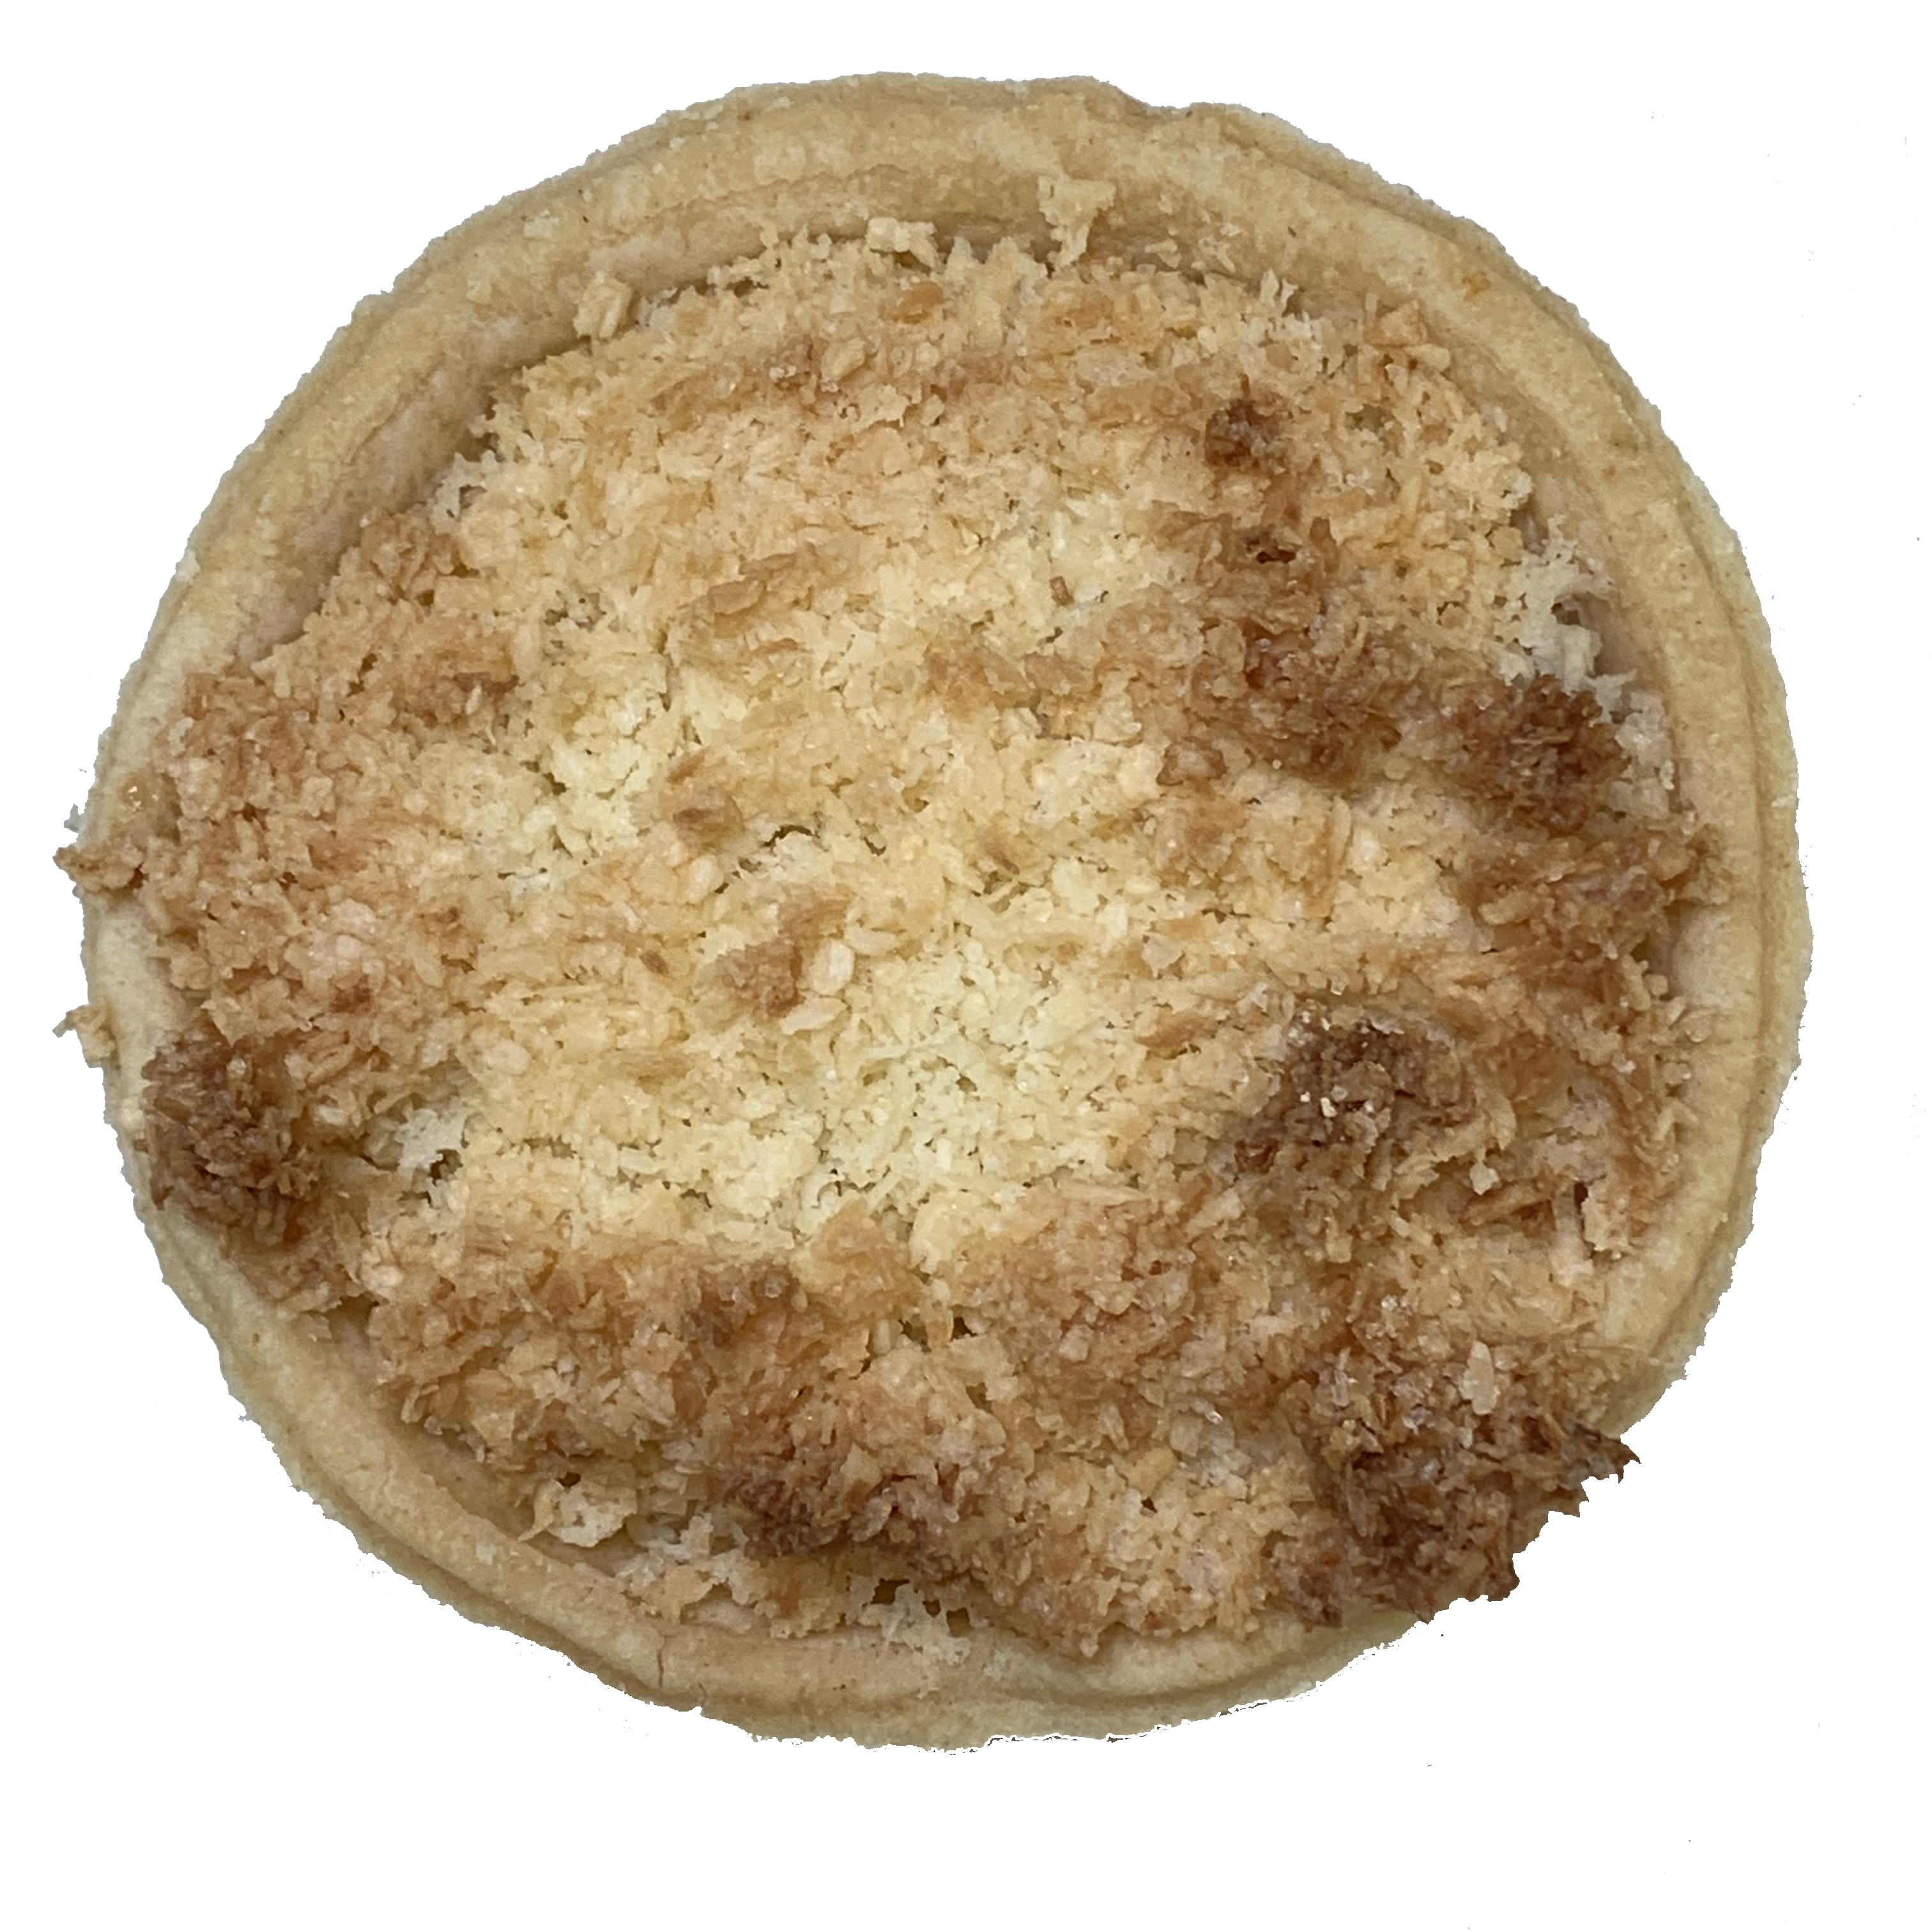 Tarts - Coconut